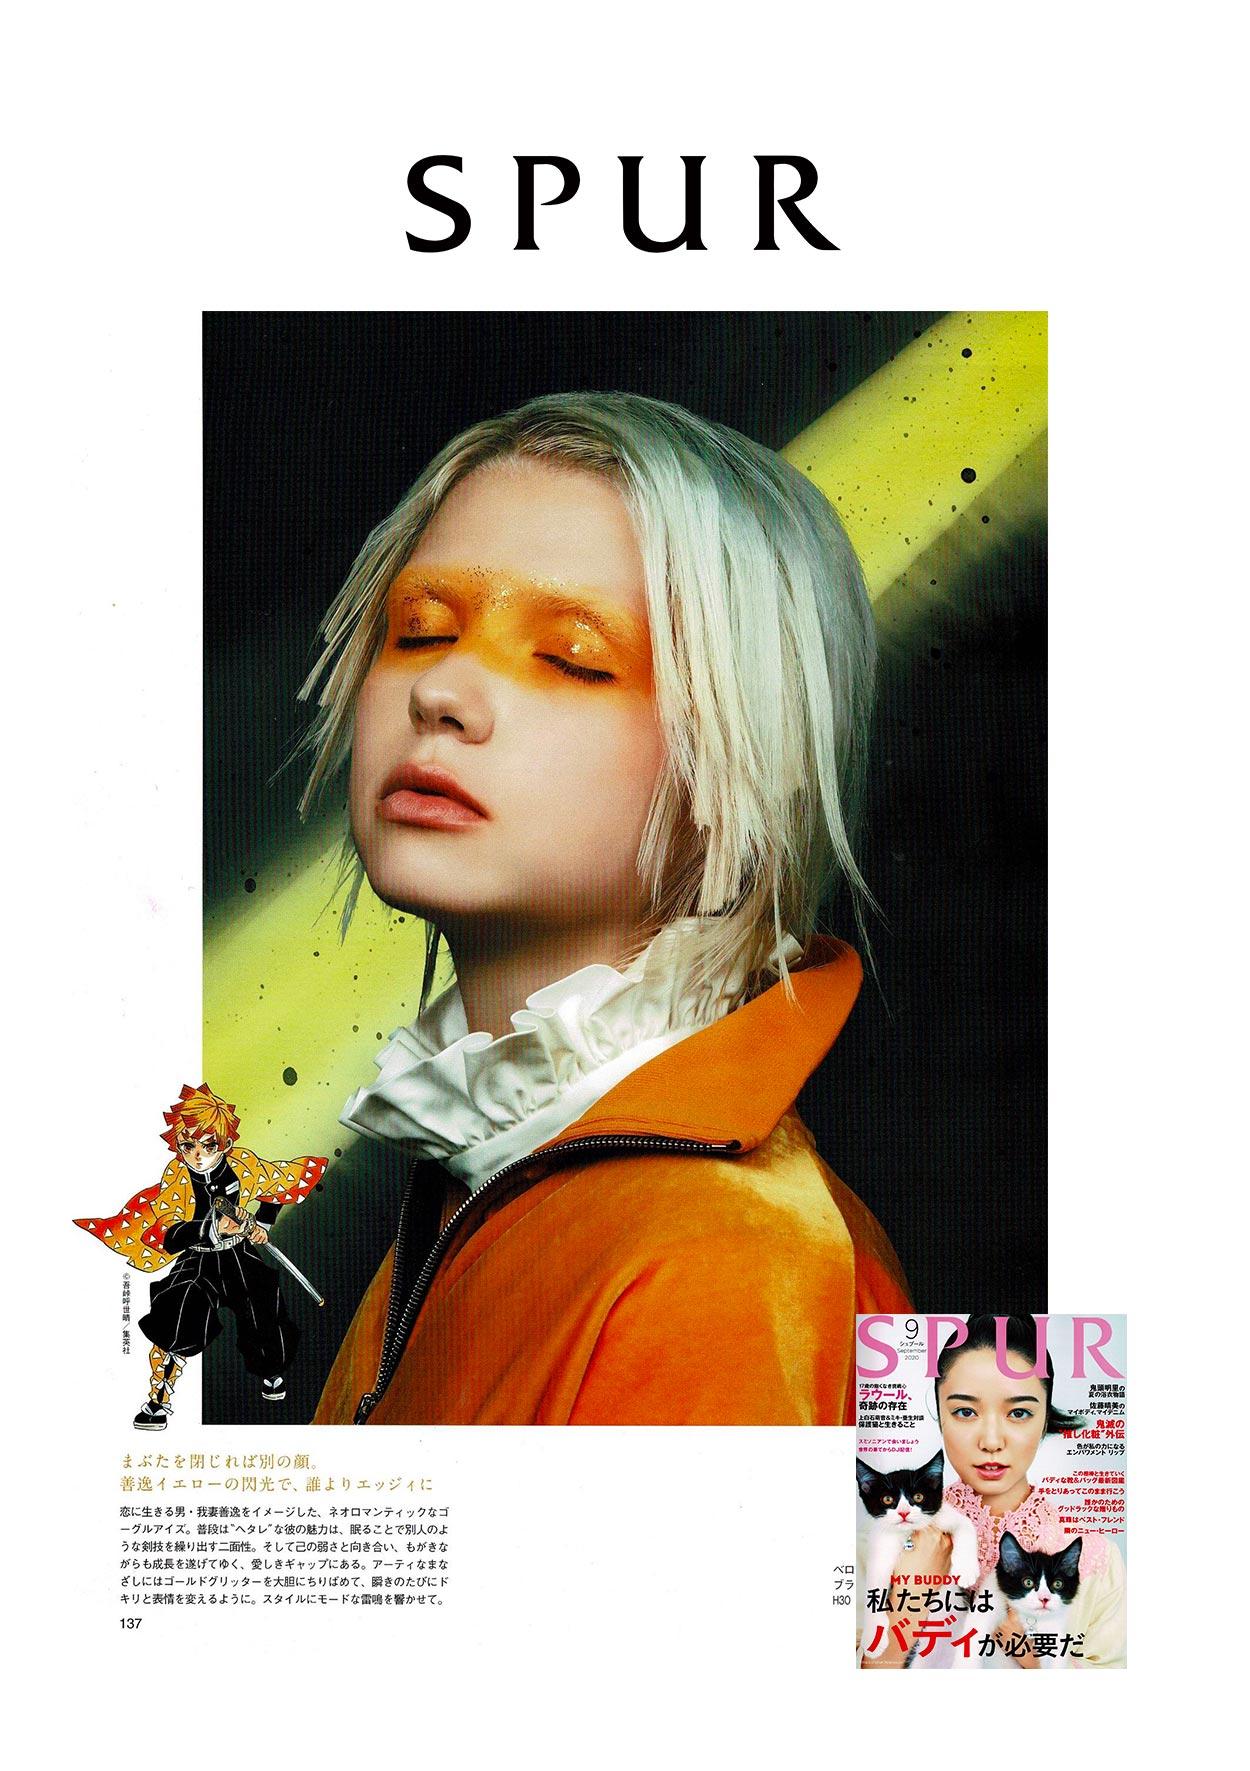 melampo press on spur Japan magazine - photo 2